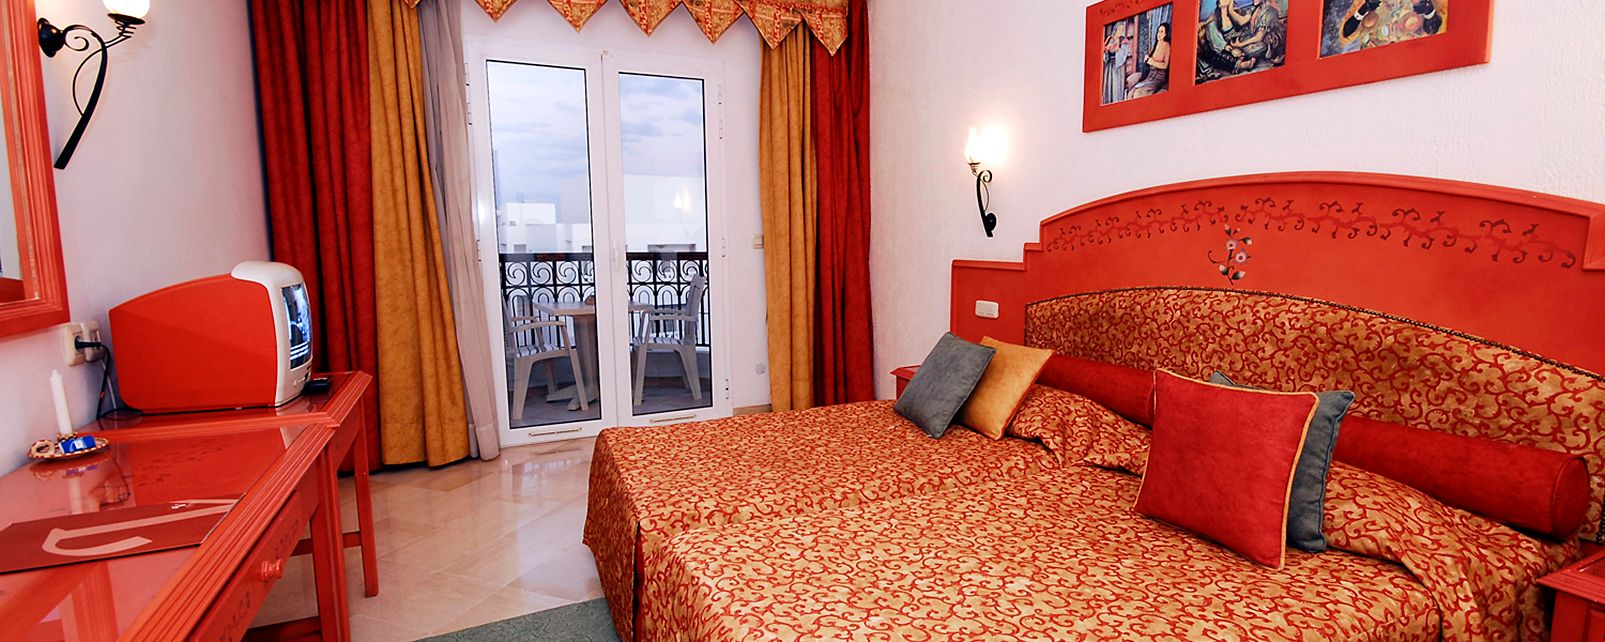 Hotel Vincci el Kantaoui Center